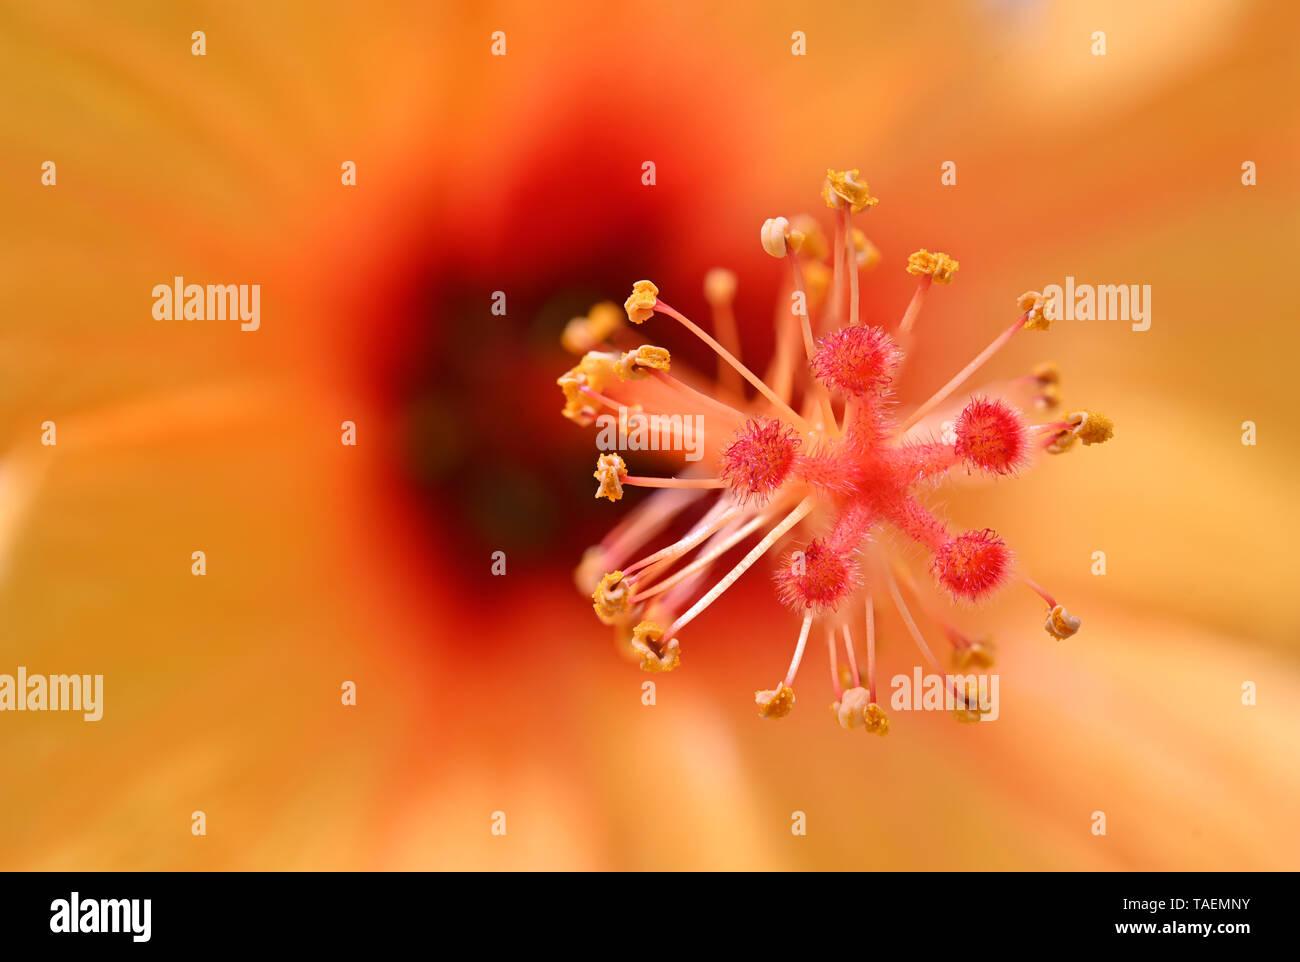 Hibiscus flower - Stock Image